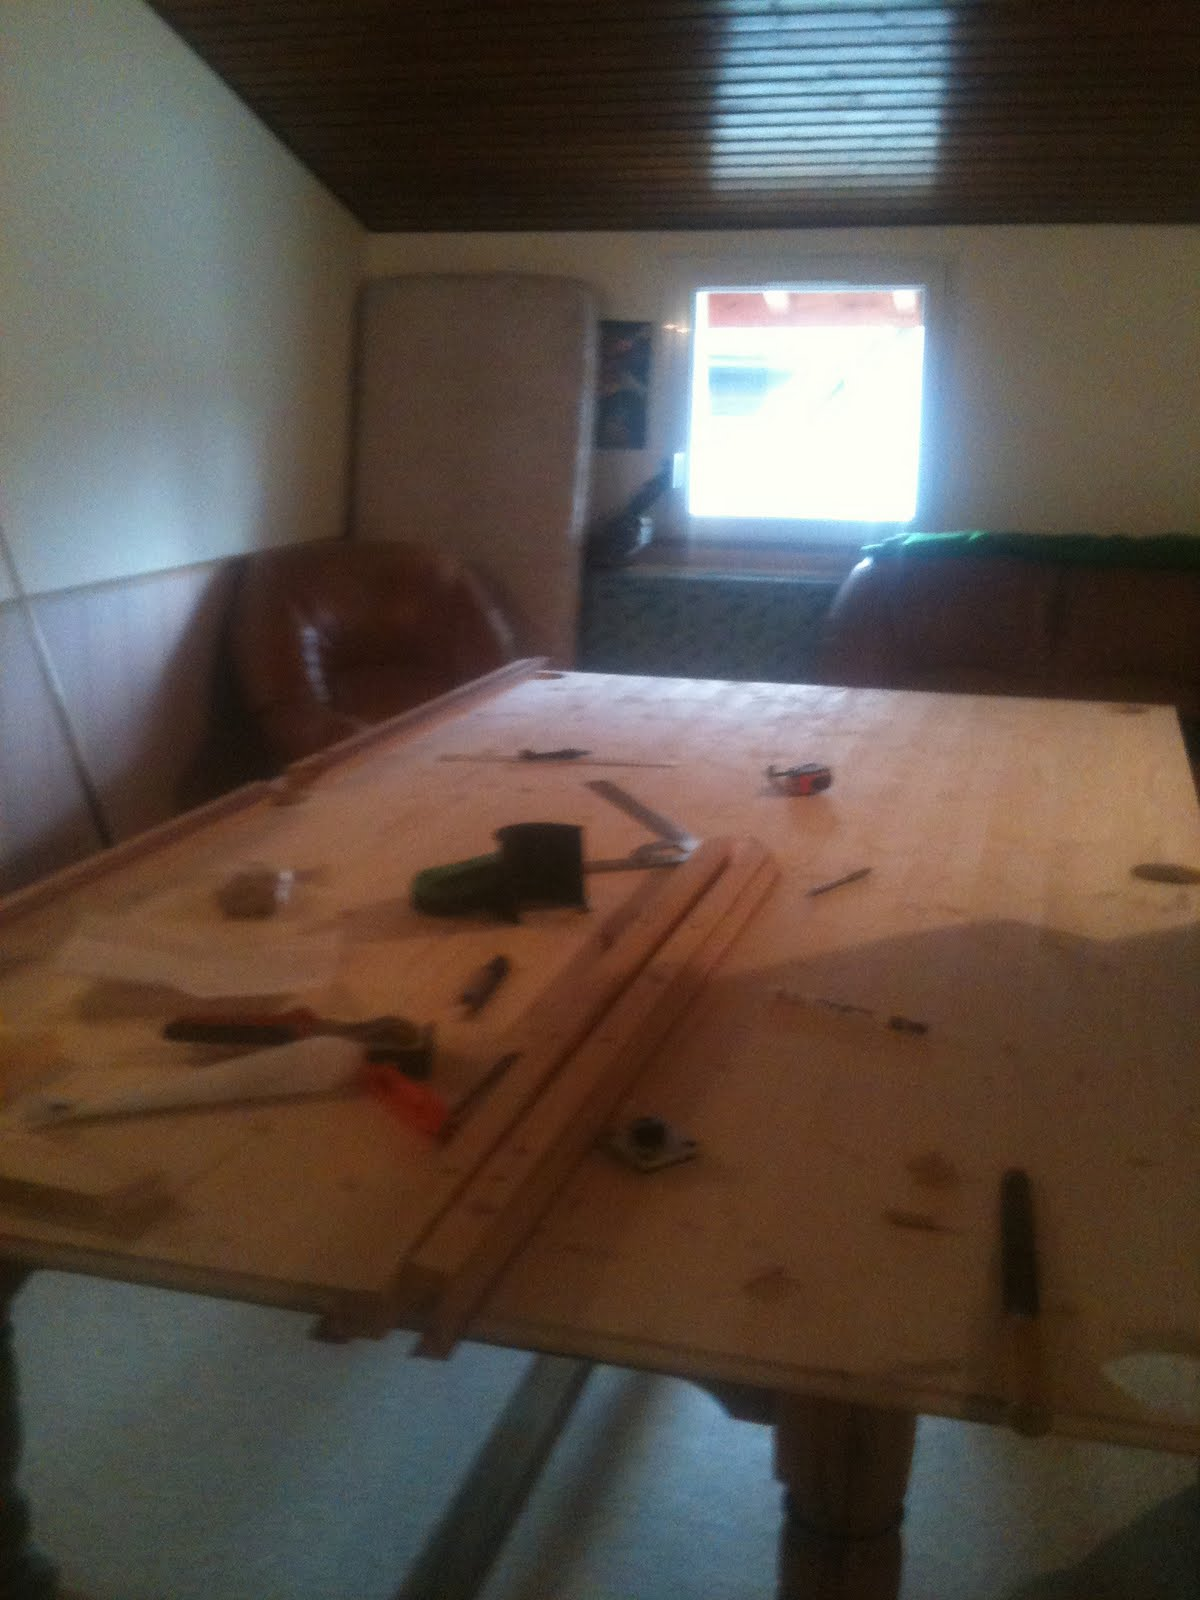 fabriquer son billard comment construire un billard etat des lieux. Black Bedroom Furniture Sets. Home Design Ideas